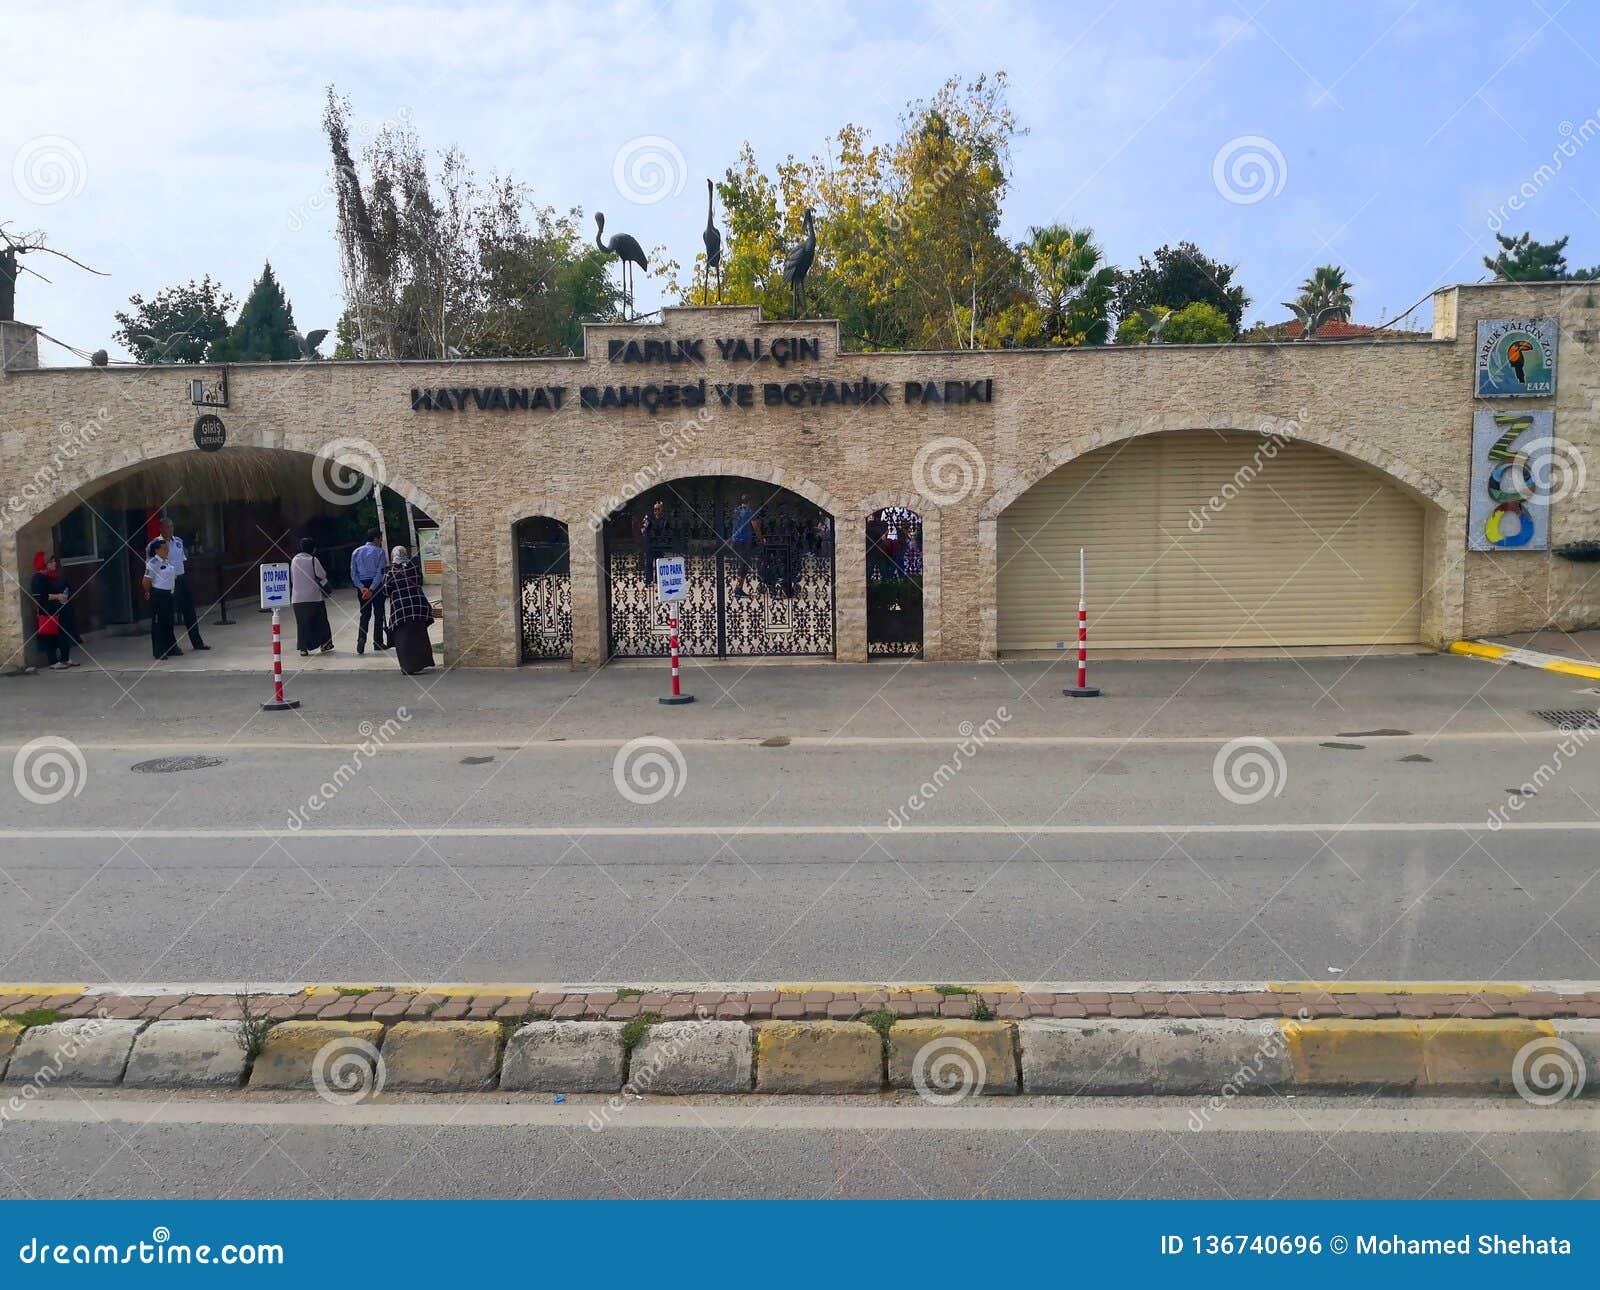 Externe Ansicht für Faruk Yalcin-Zoo in Istanbul